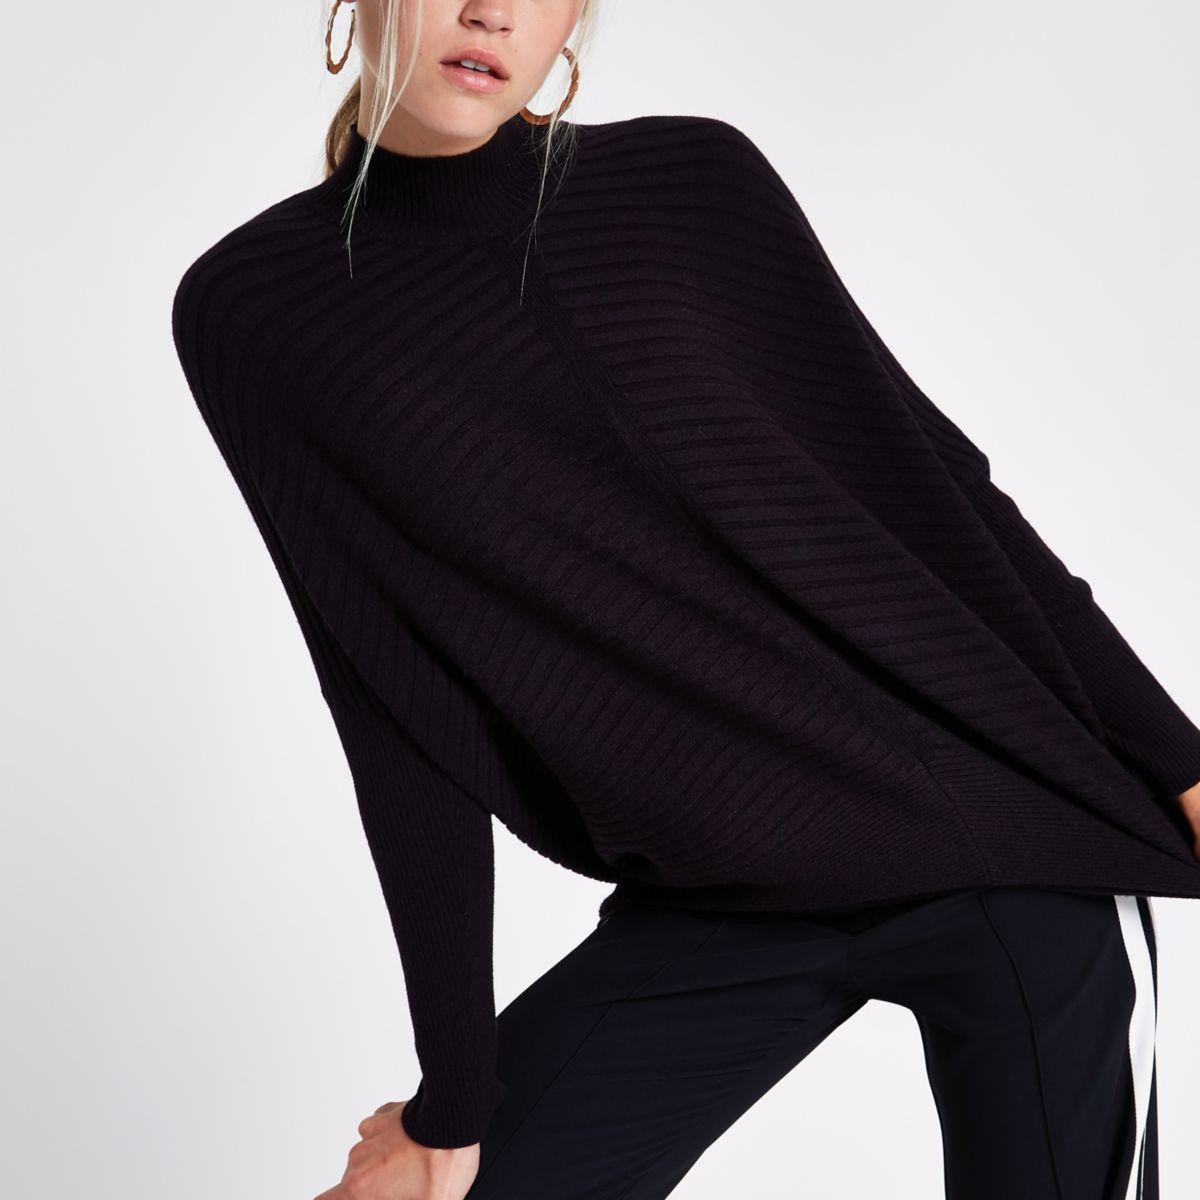 Black rib knit high neck long sleeve sweater